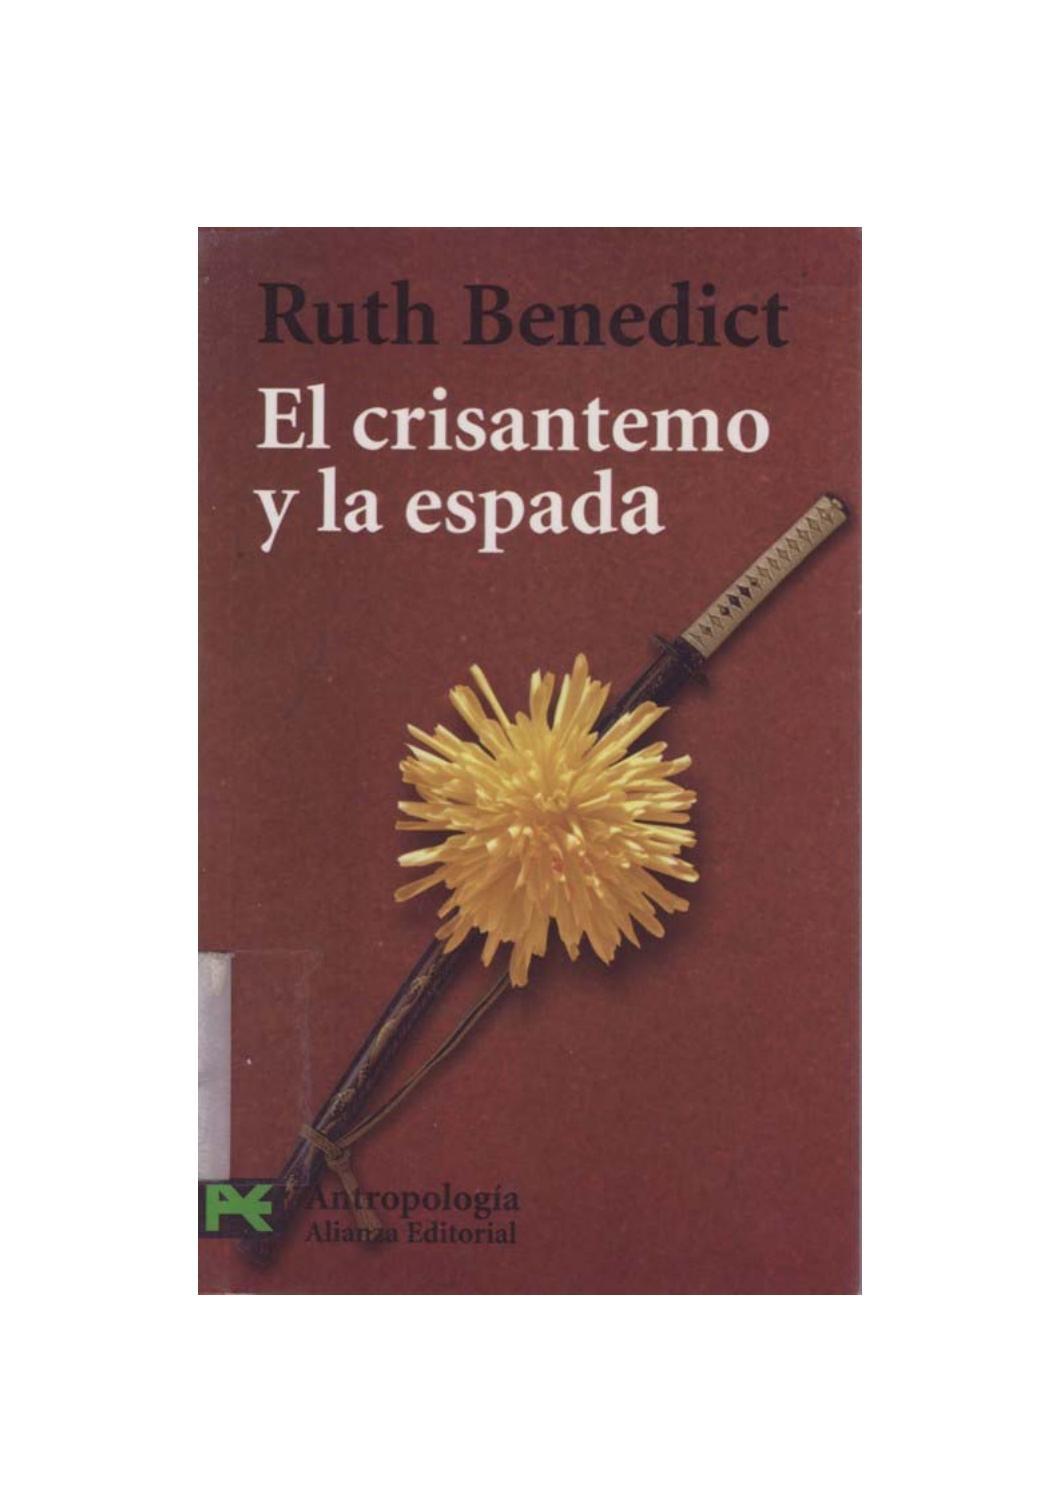 08926bb480 226613442 benedict ruth el crisantemo y la espada pdf by Clariola Fenoll  Garcia - issuu